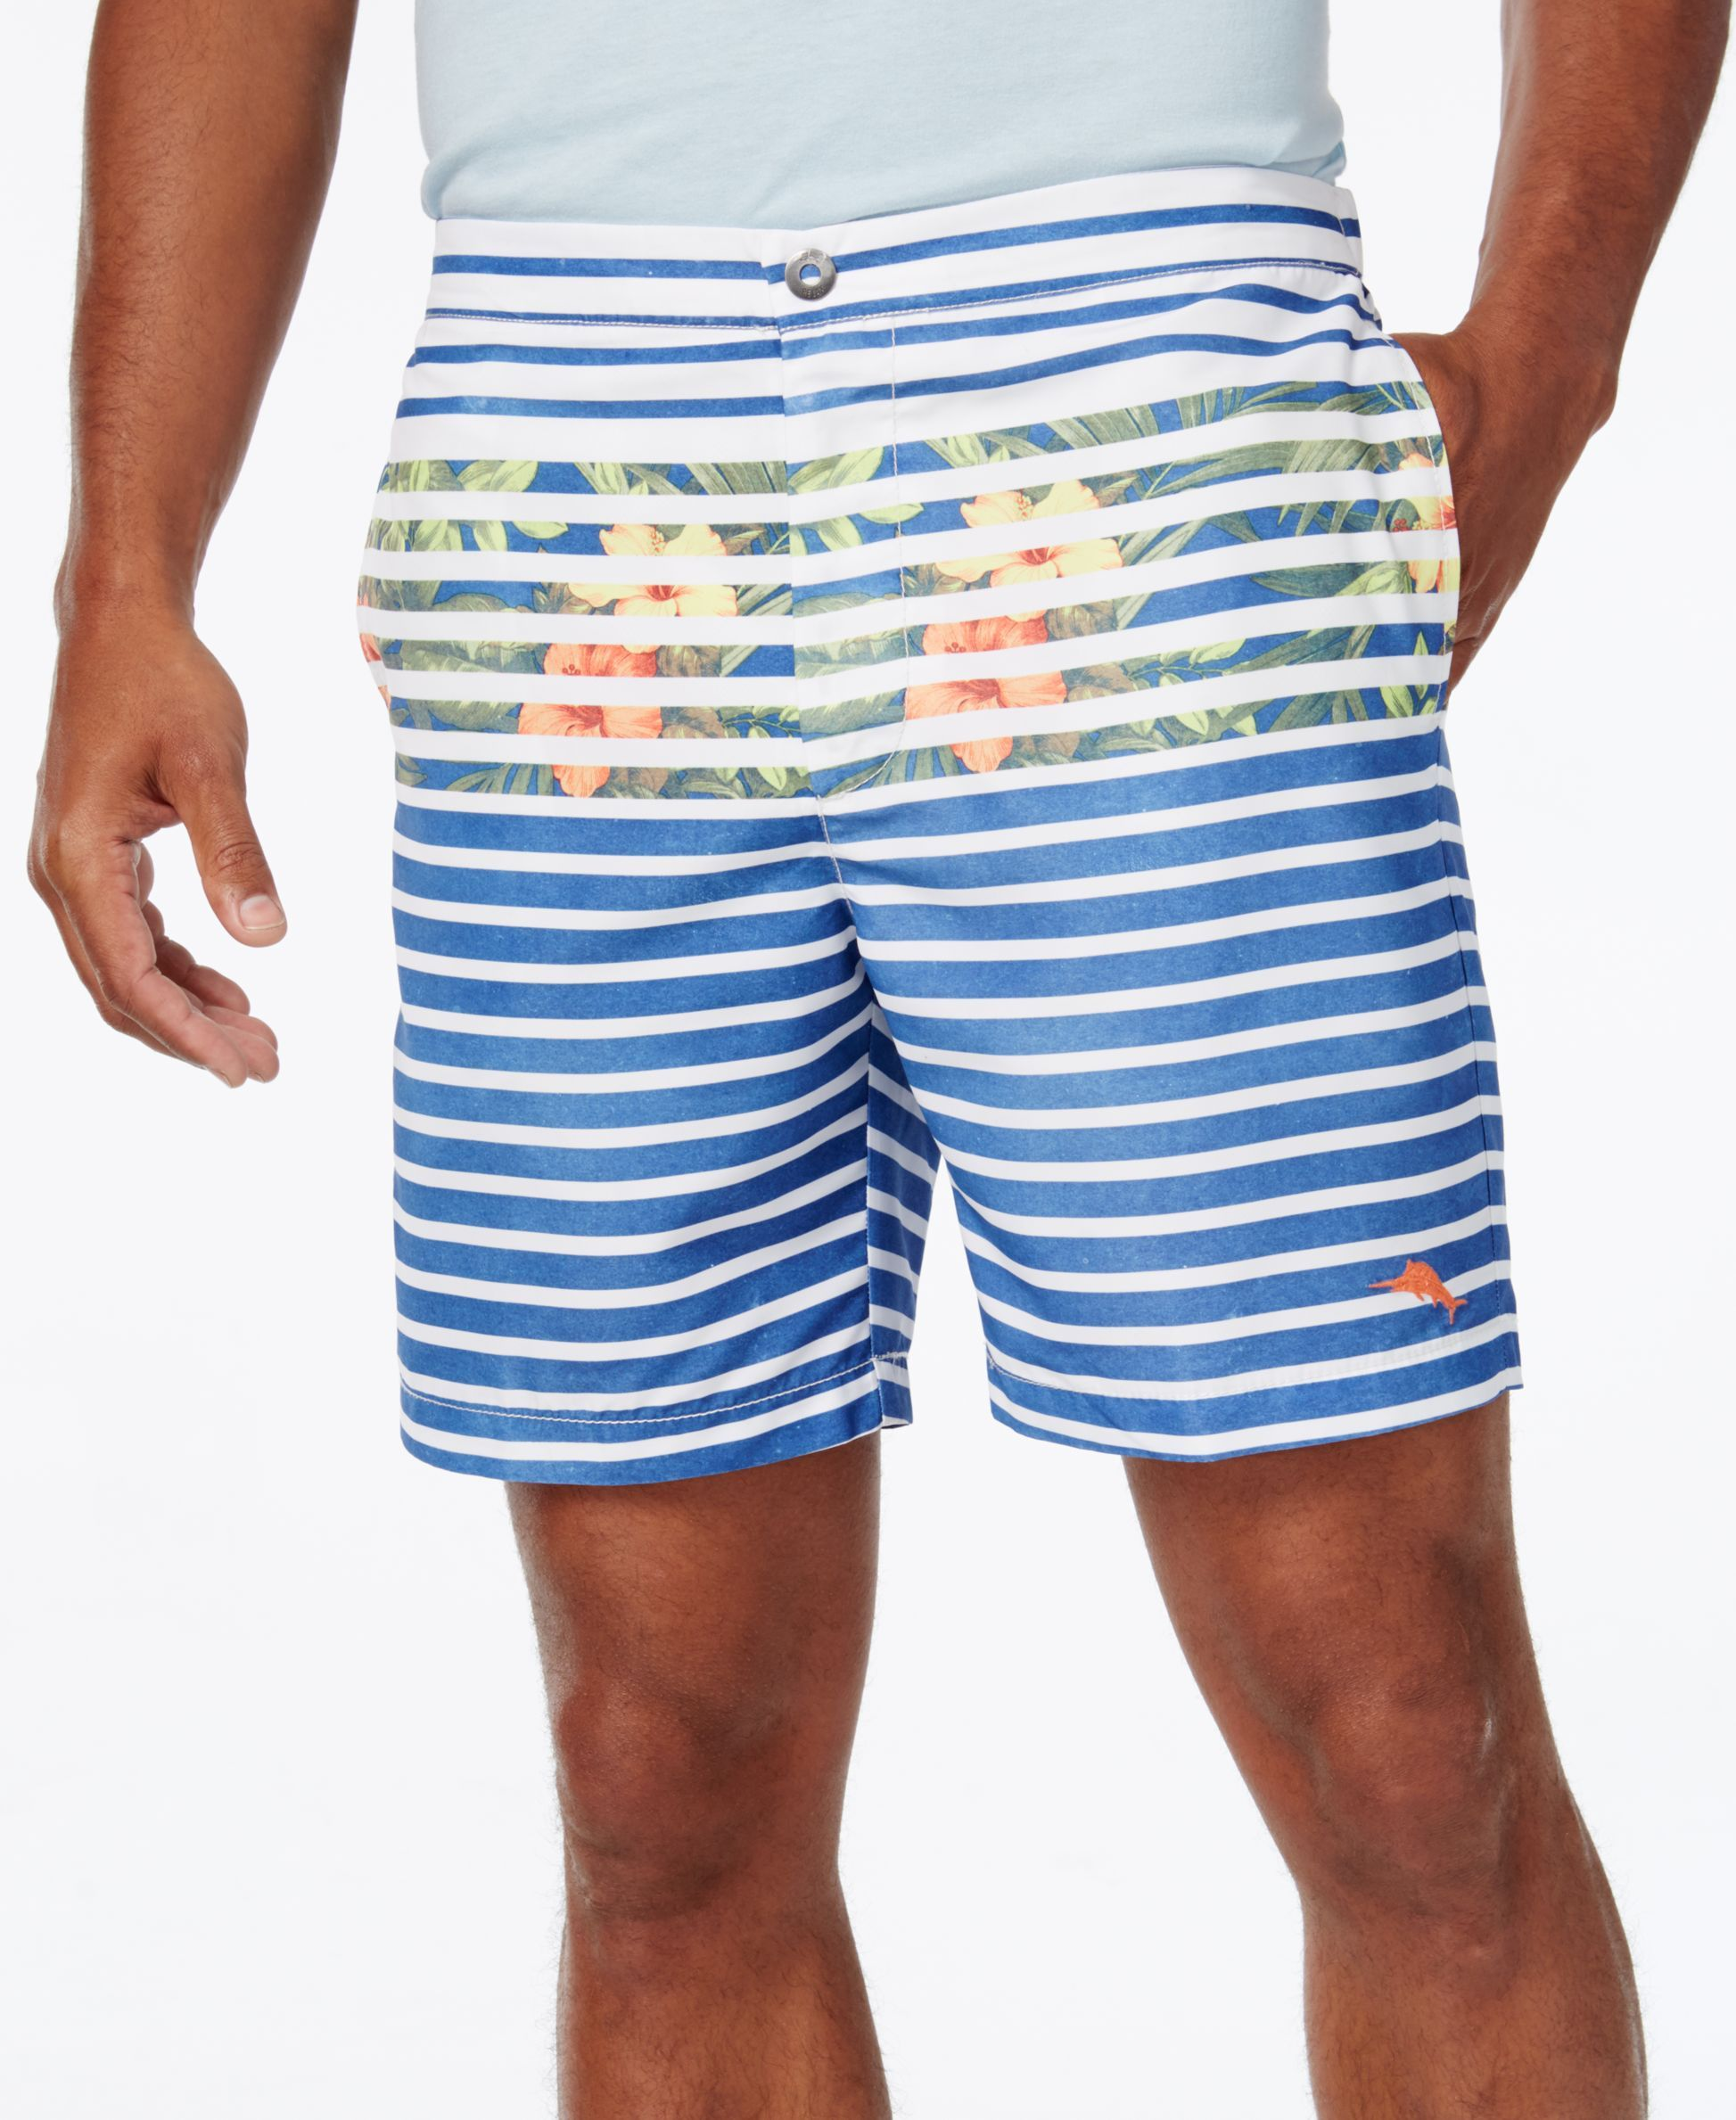 7d44a3bc5ed026 Tommy Bahama Men's Coast Breton Blooms Swim Trunks | Men clothing ...